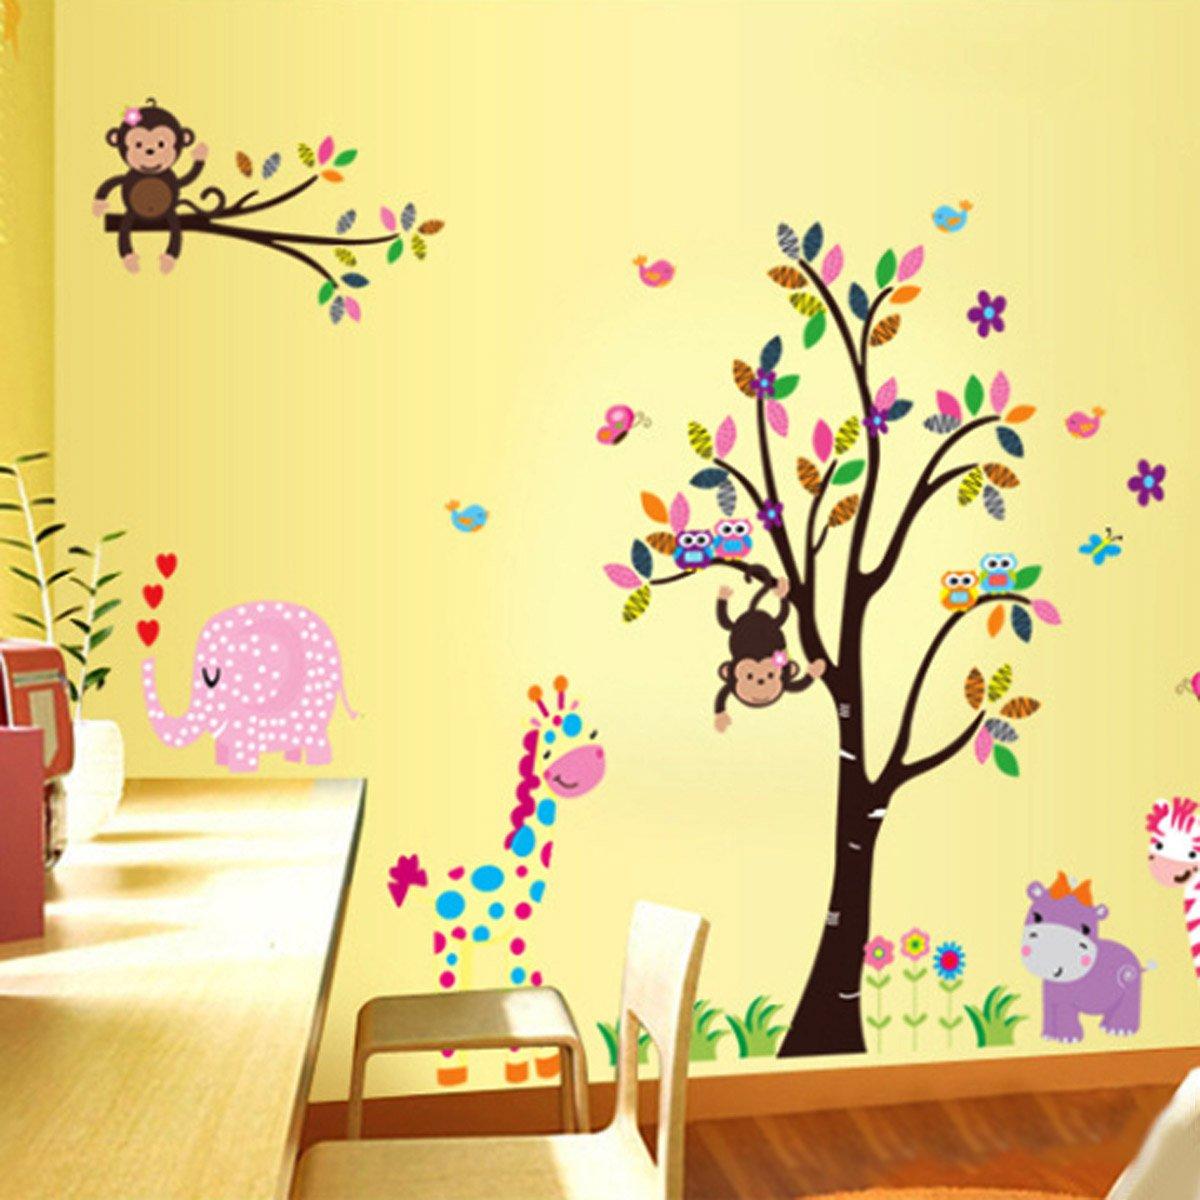 yesurprise vinilo decorativo vinilos infantiles dormitorio